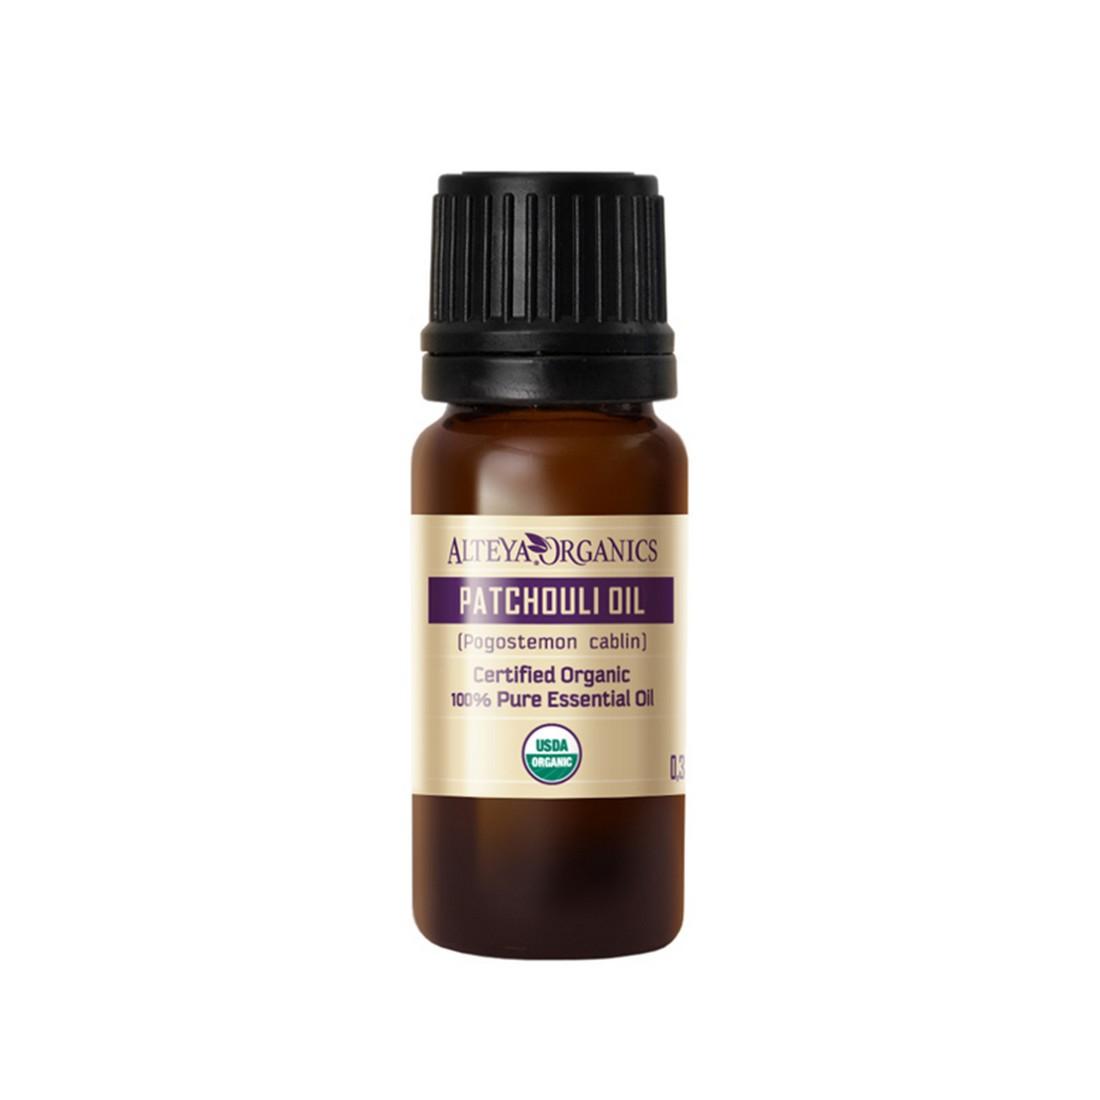 Bio organic patchouli essential oil Alteya Organics 10 ml.